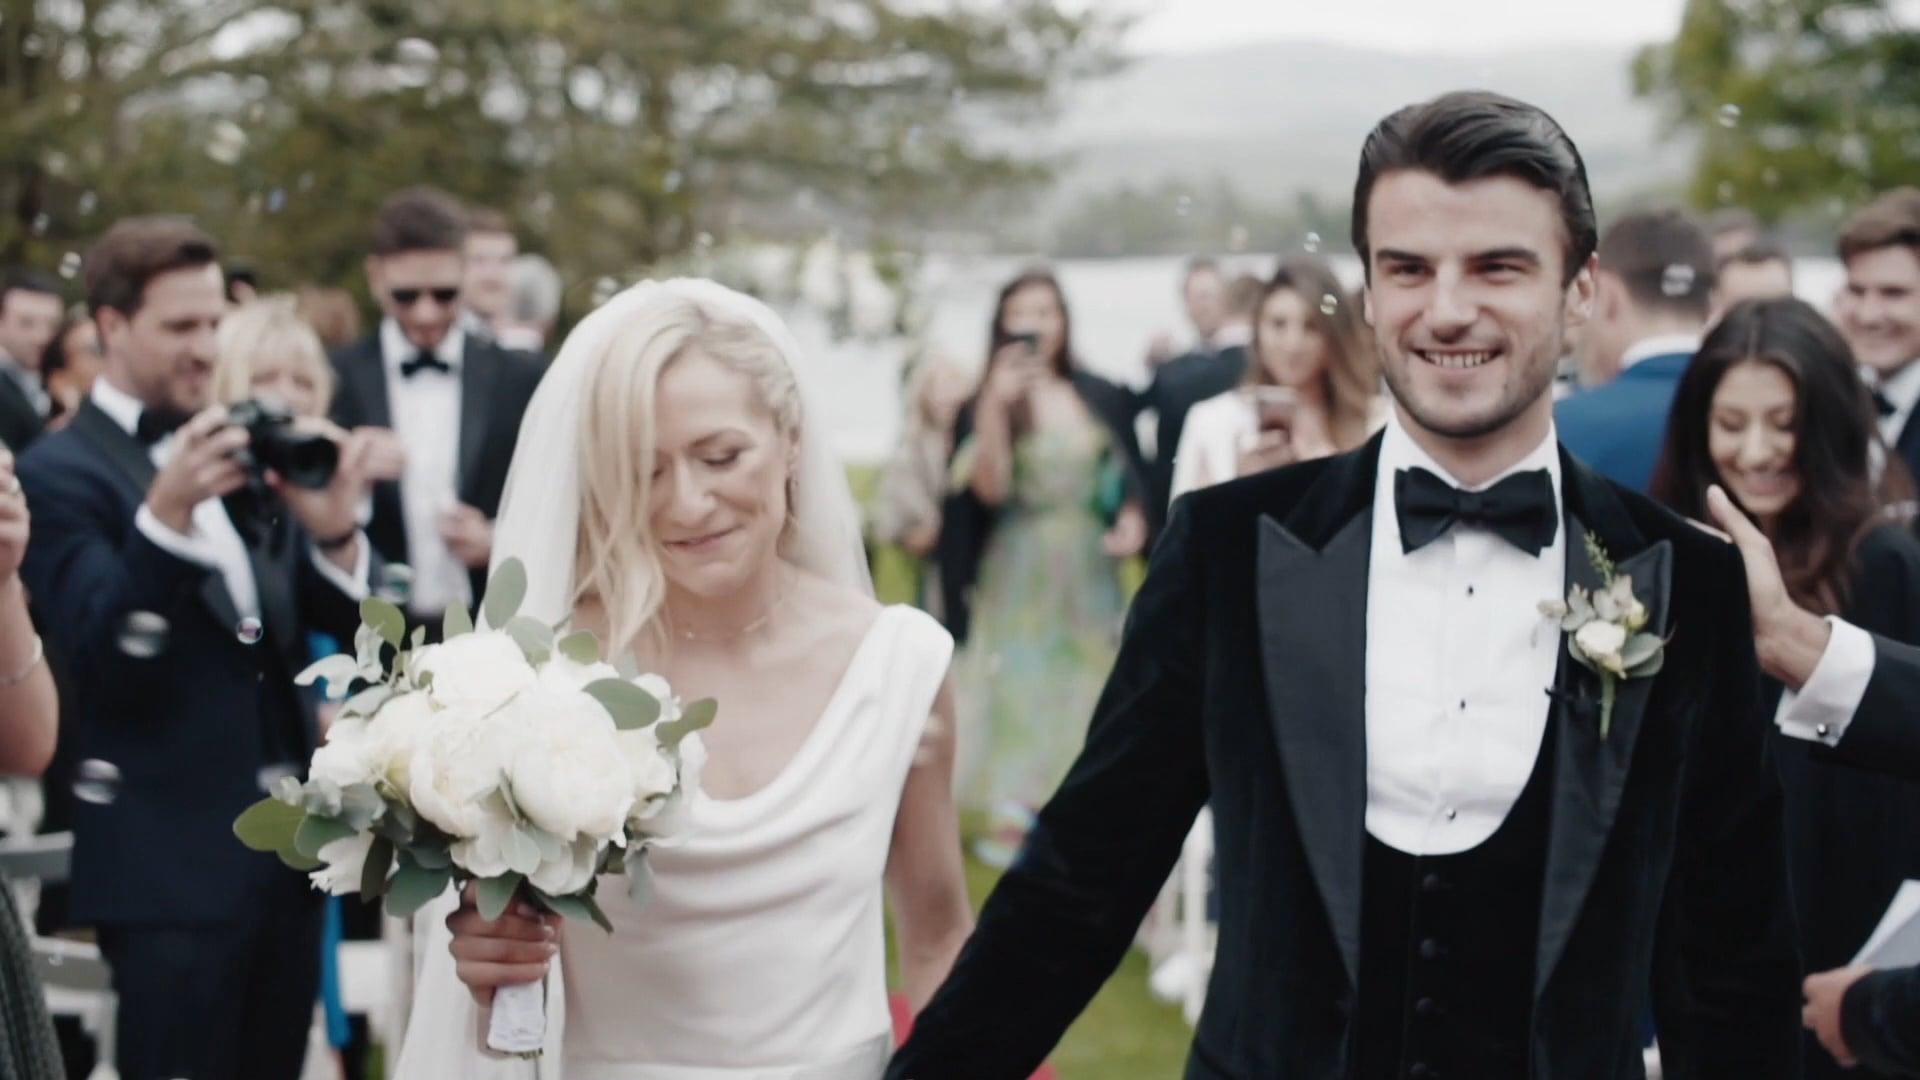 Emma & Joe // Destination wedding in Kenmare, Co Kerry, Ireland